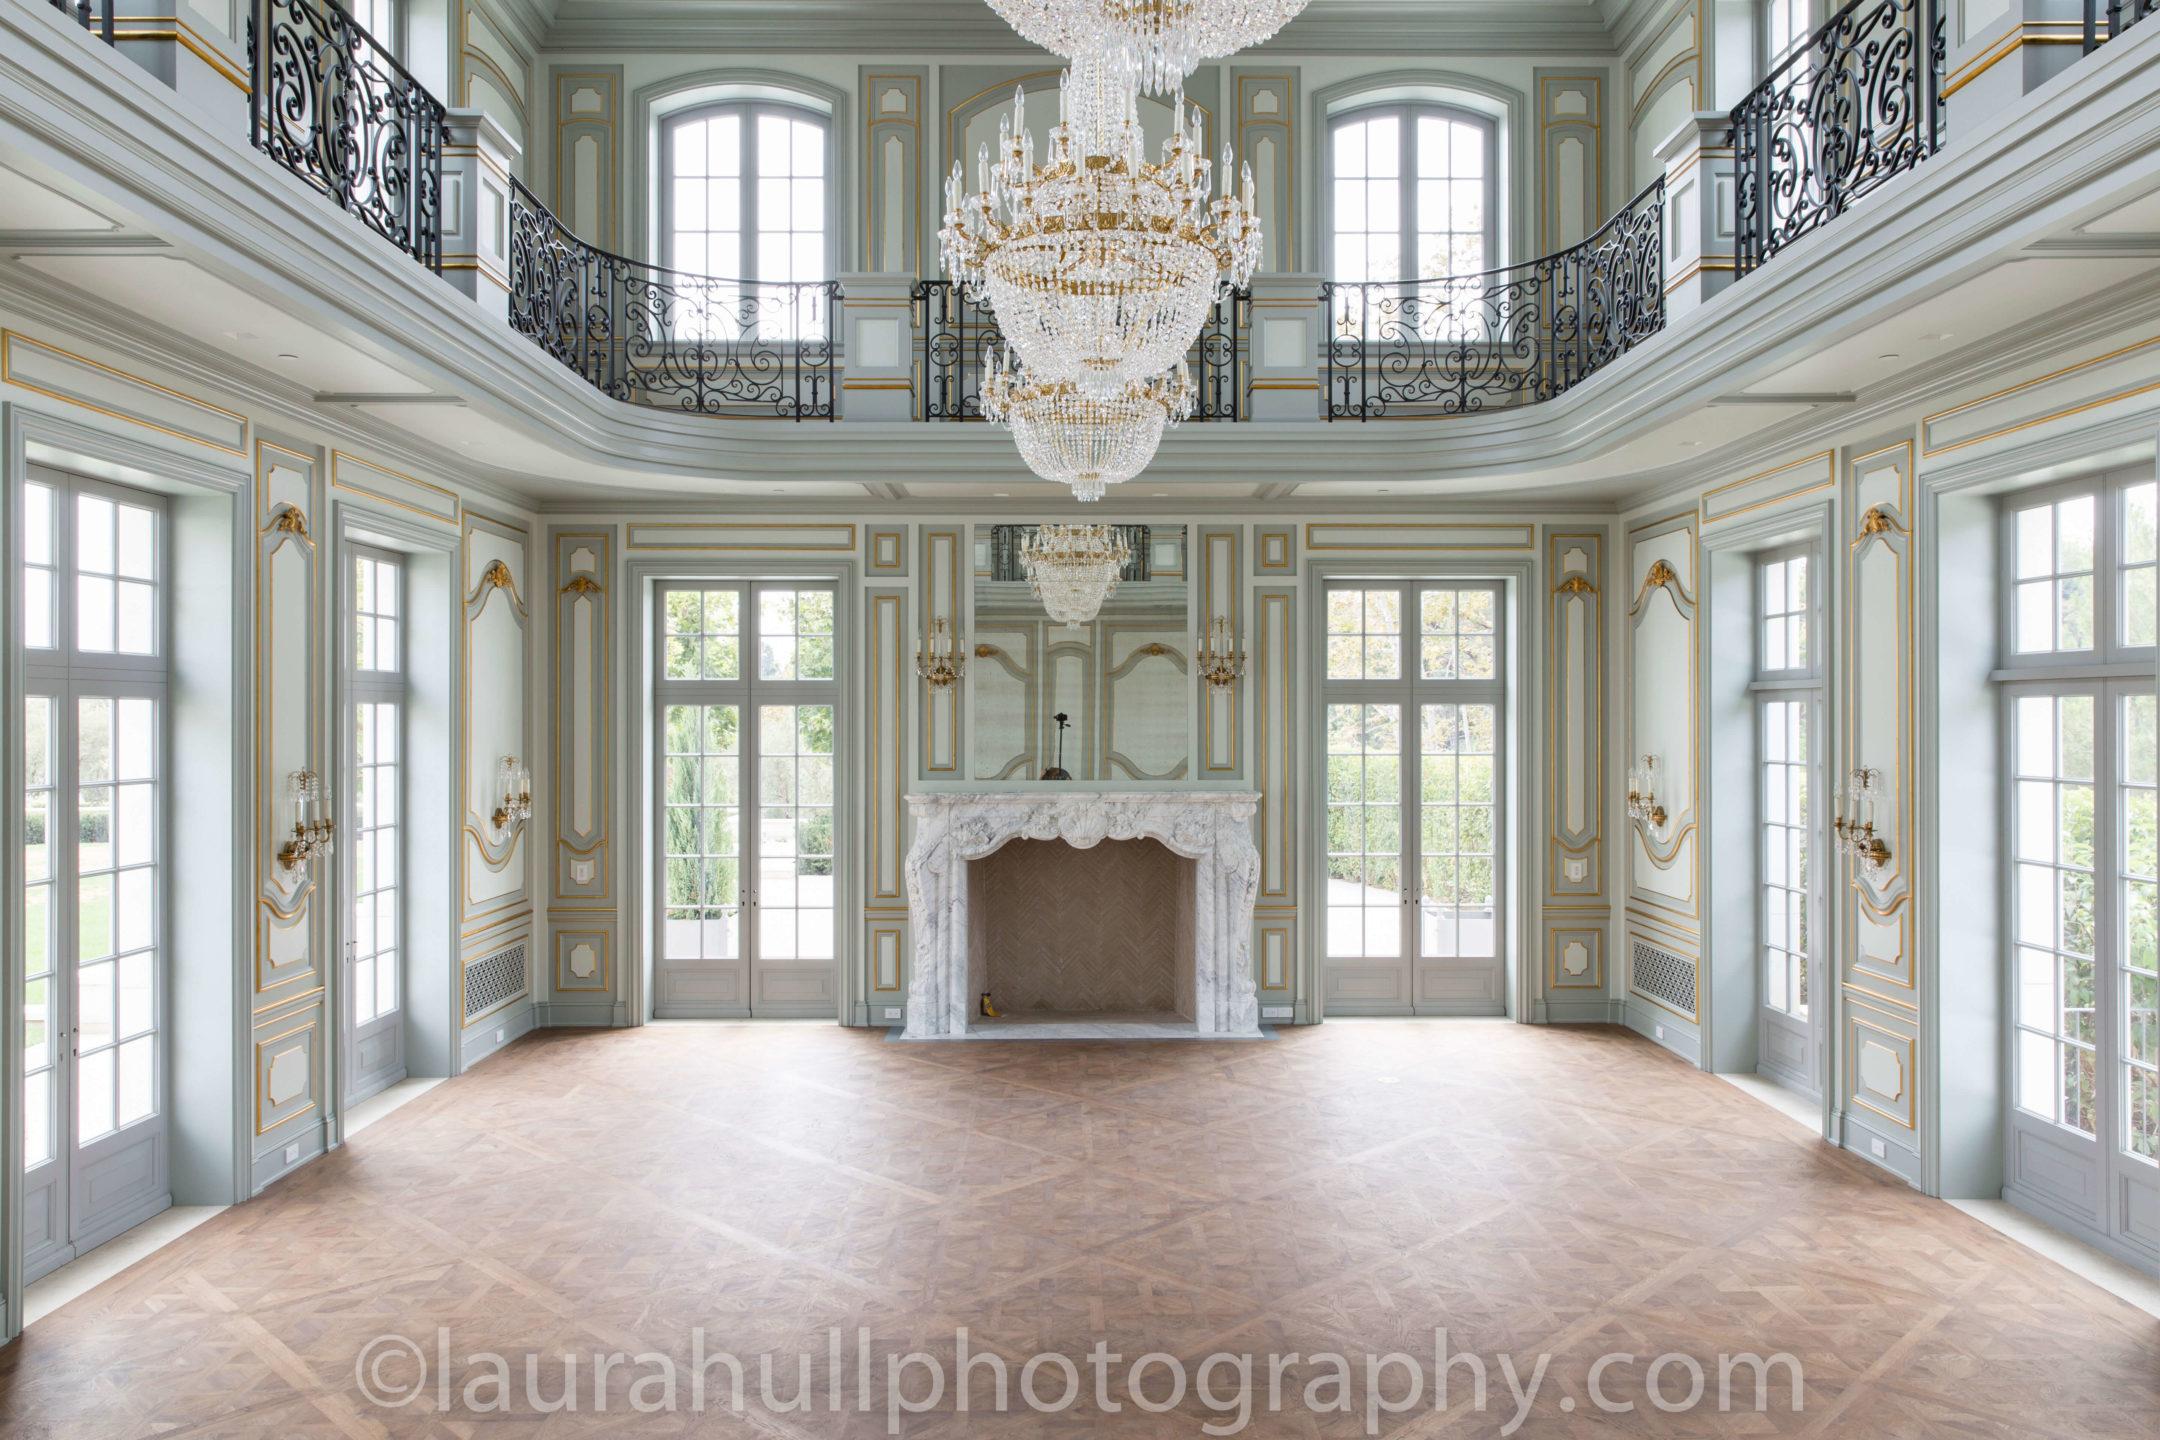 studio-william-hefner-chateau-des-fleurs-13